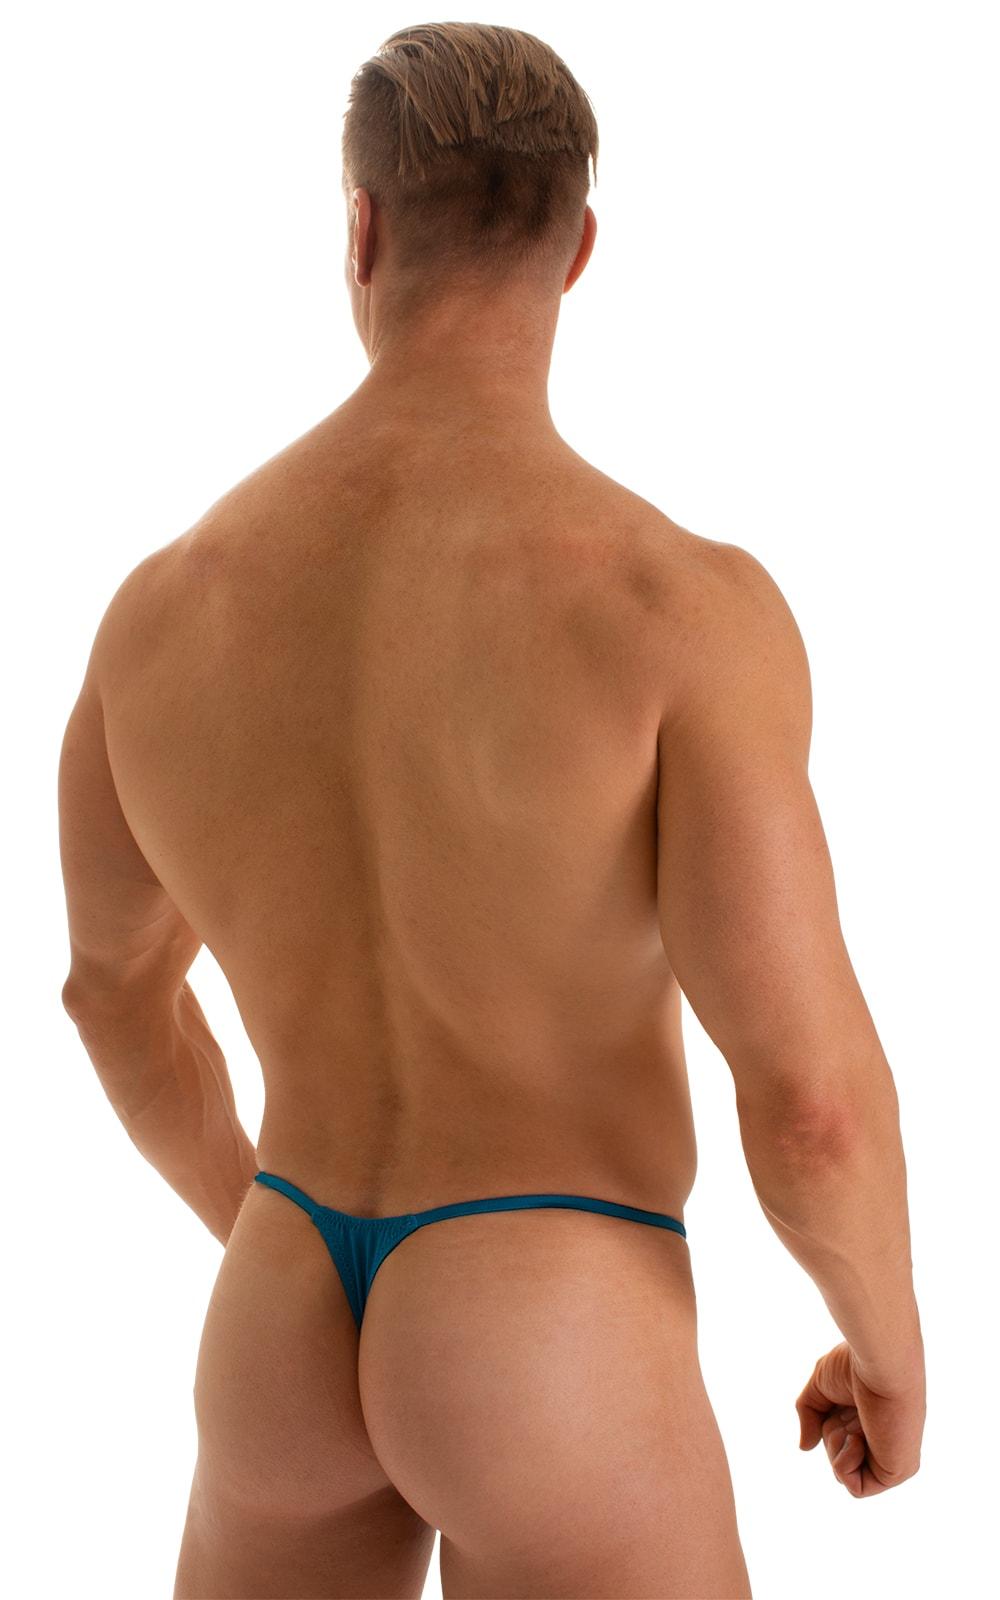 Smooth Pouch Skinny Sides Swim Thong in Mallard 2